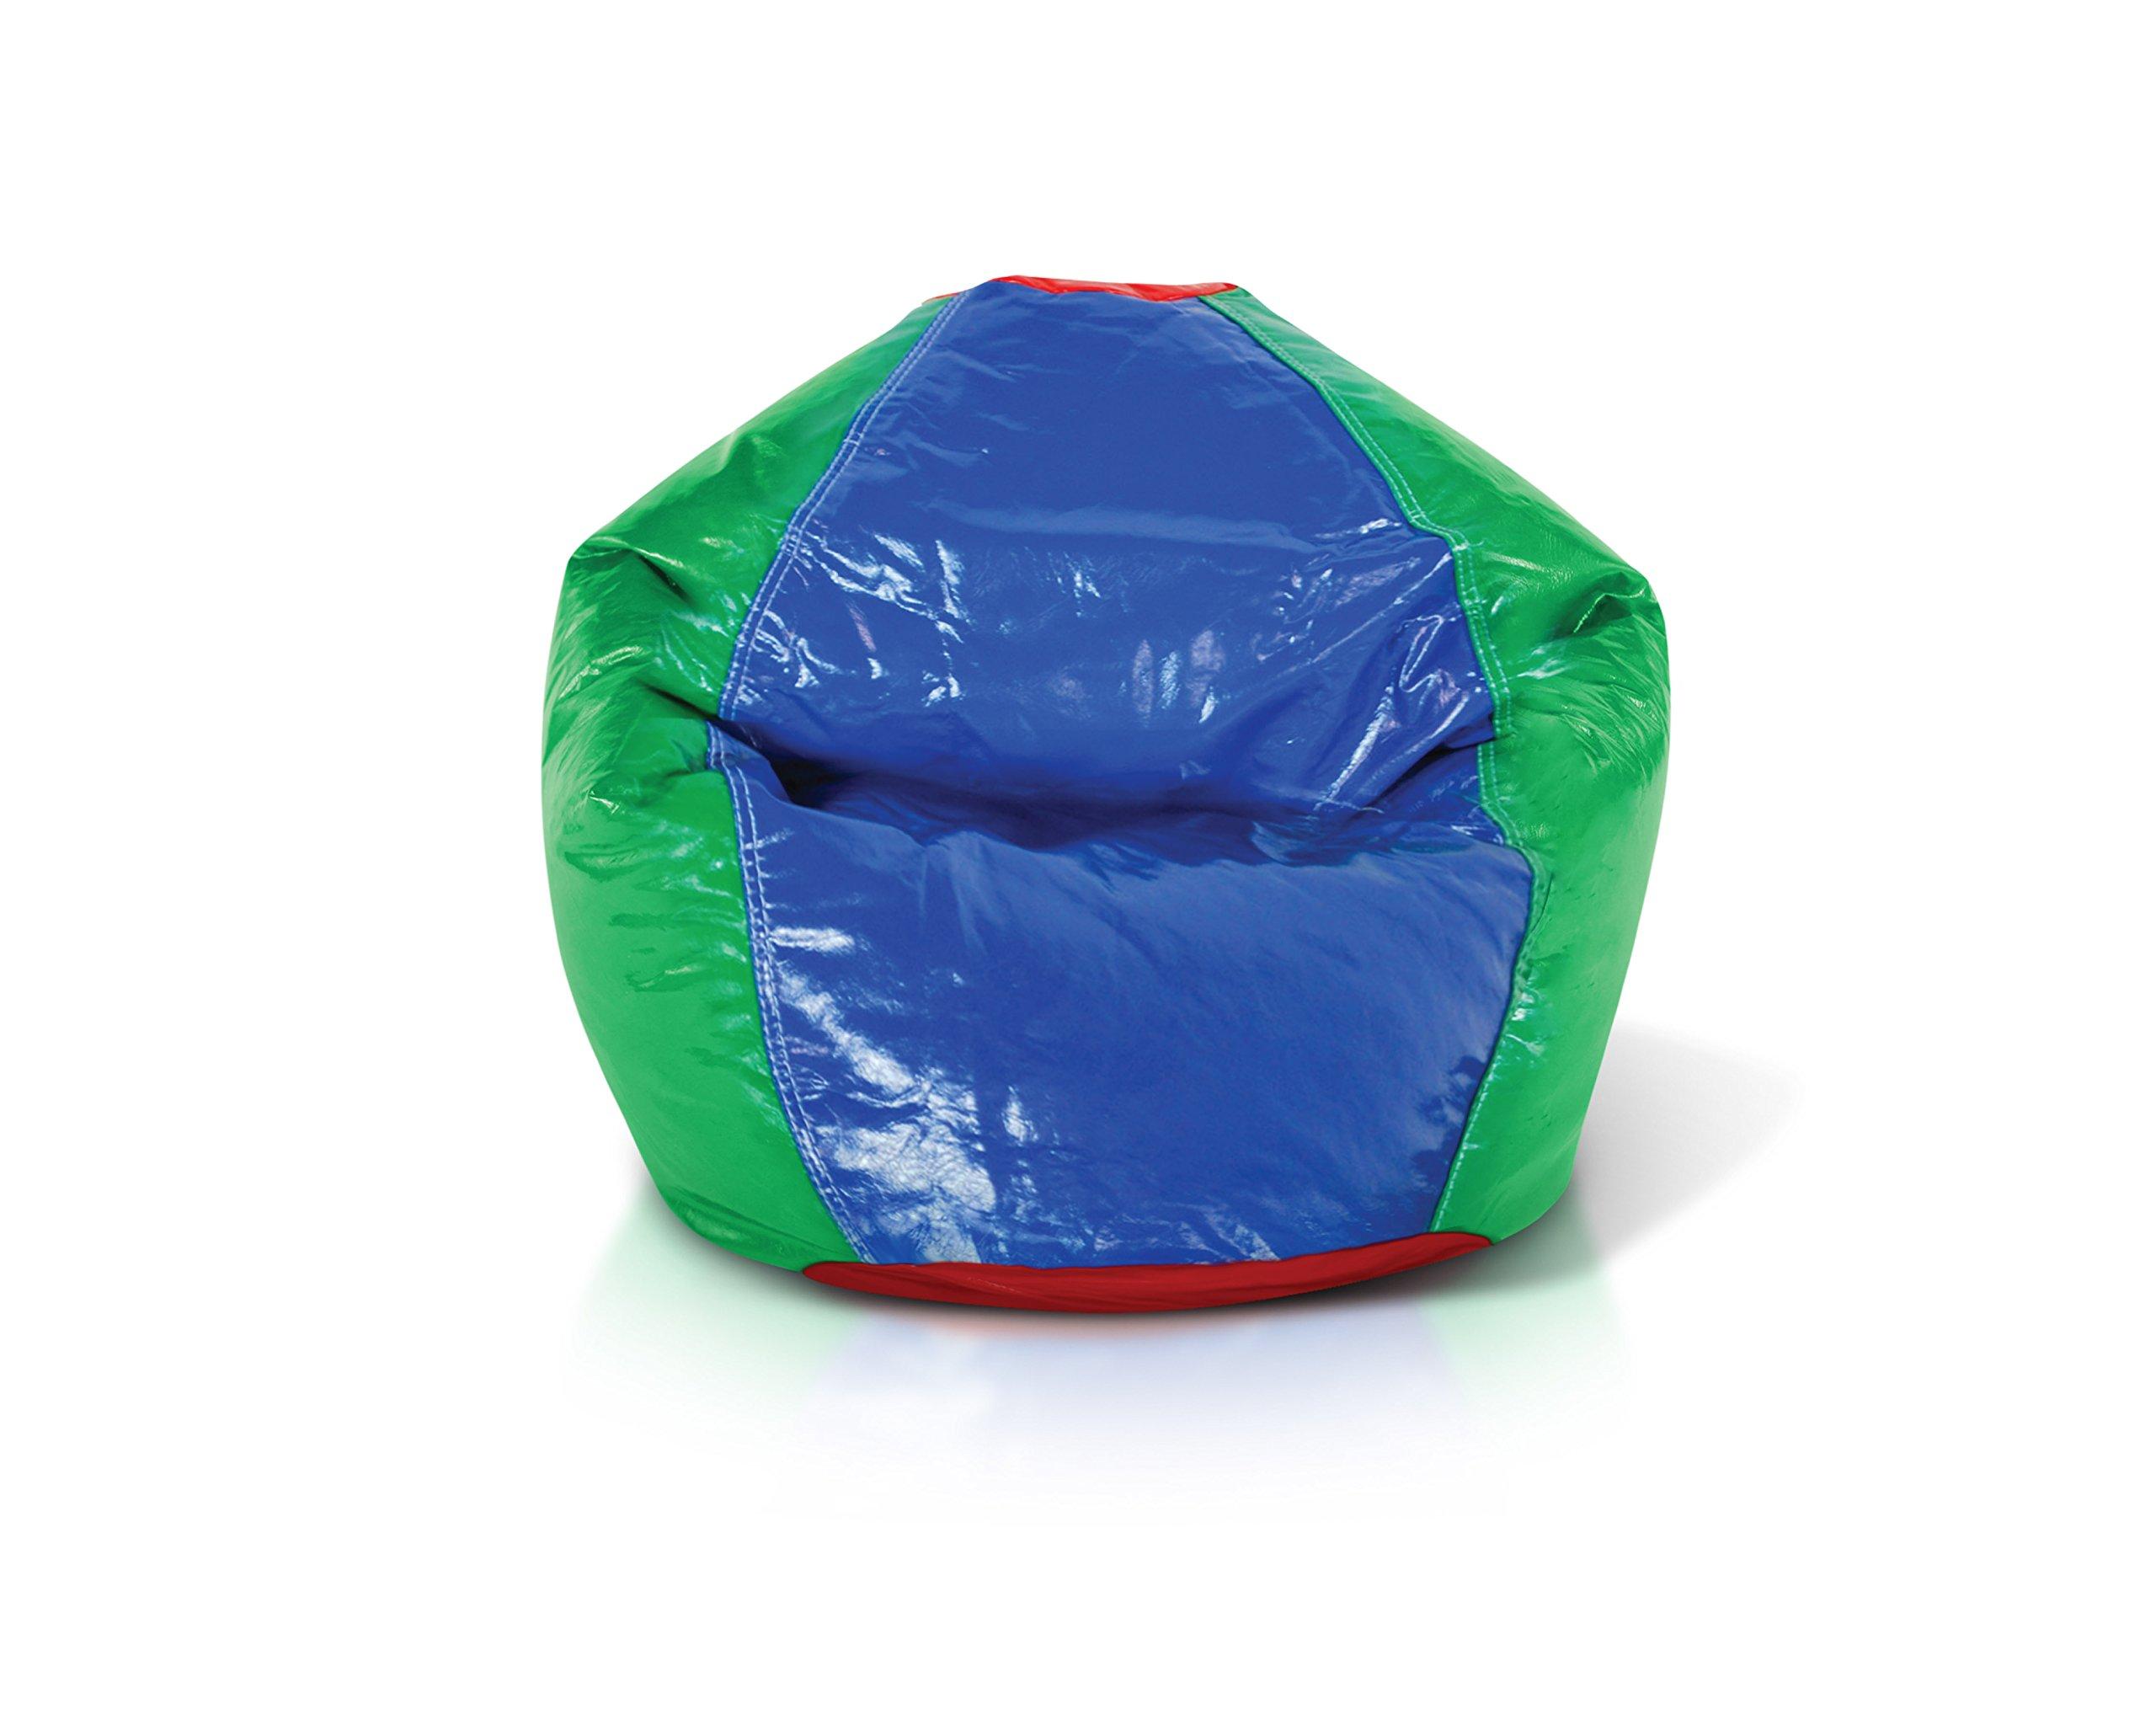 Milton Greens Stars Junior Glossy Vinyl Bean Bag, Multicolor by Milton Greens Stars